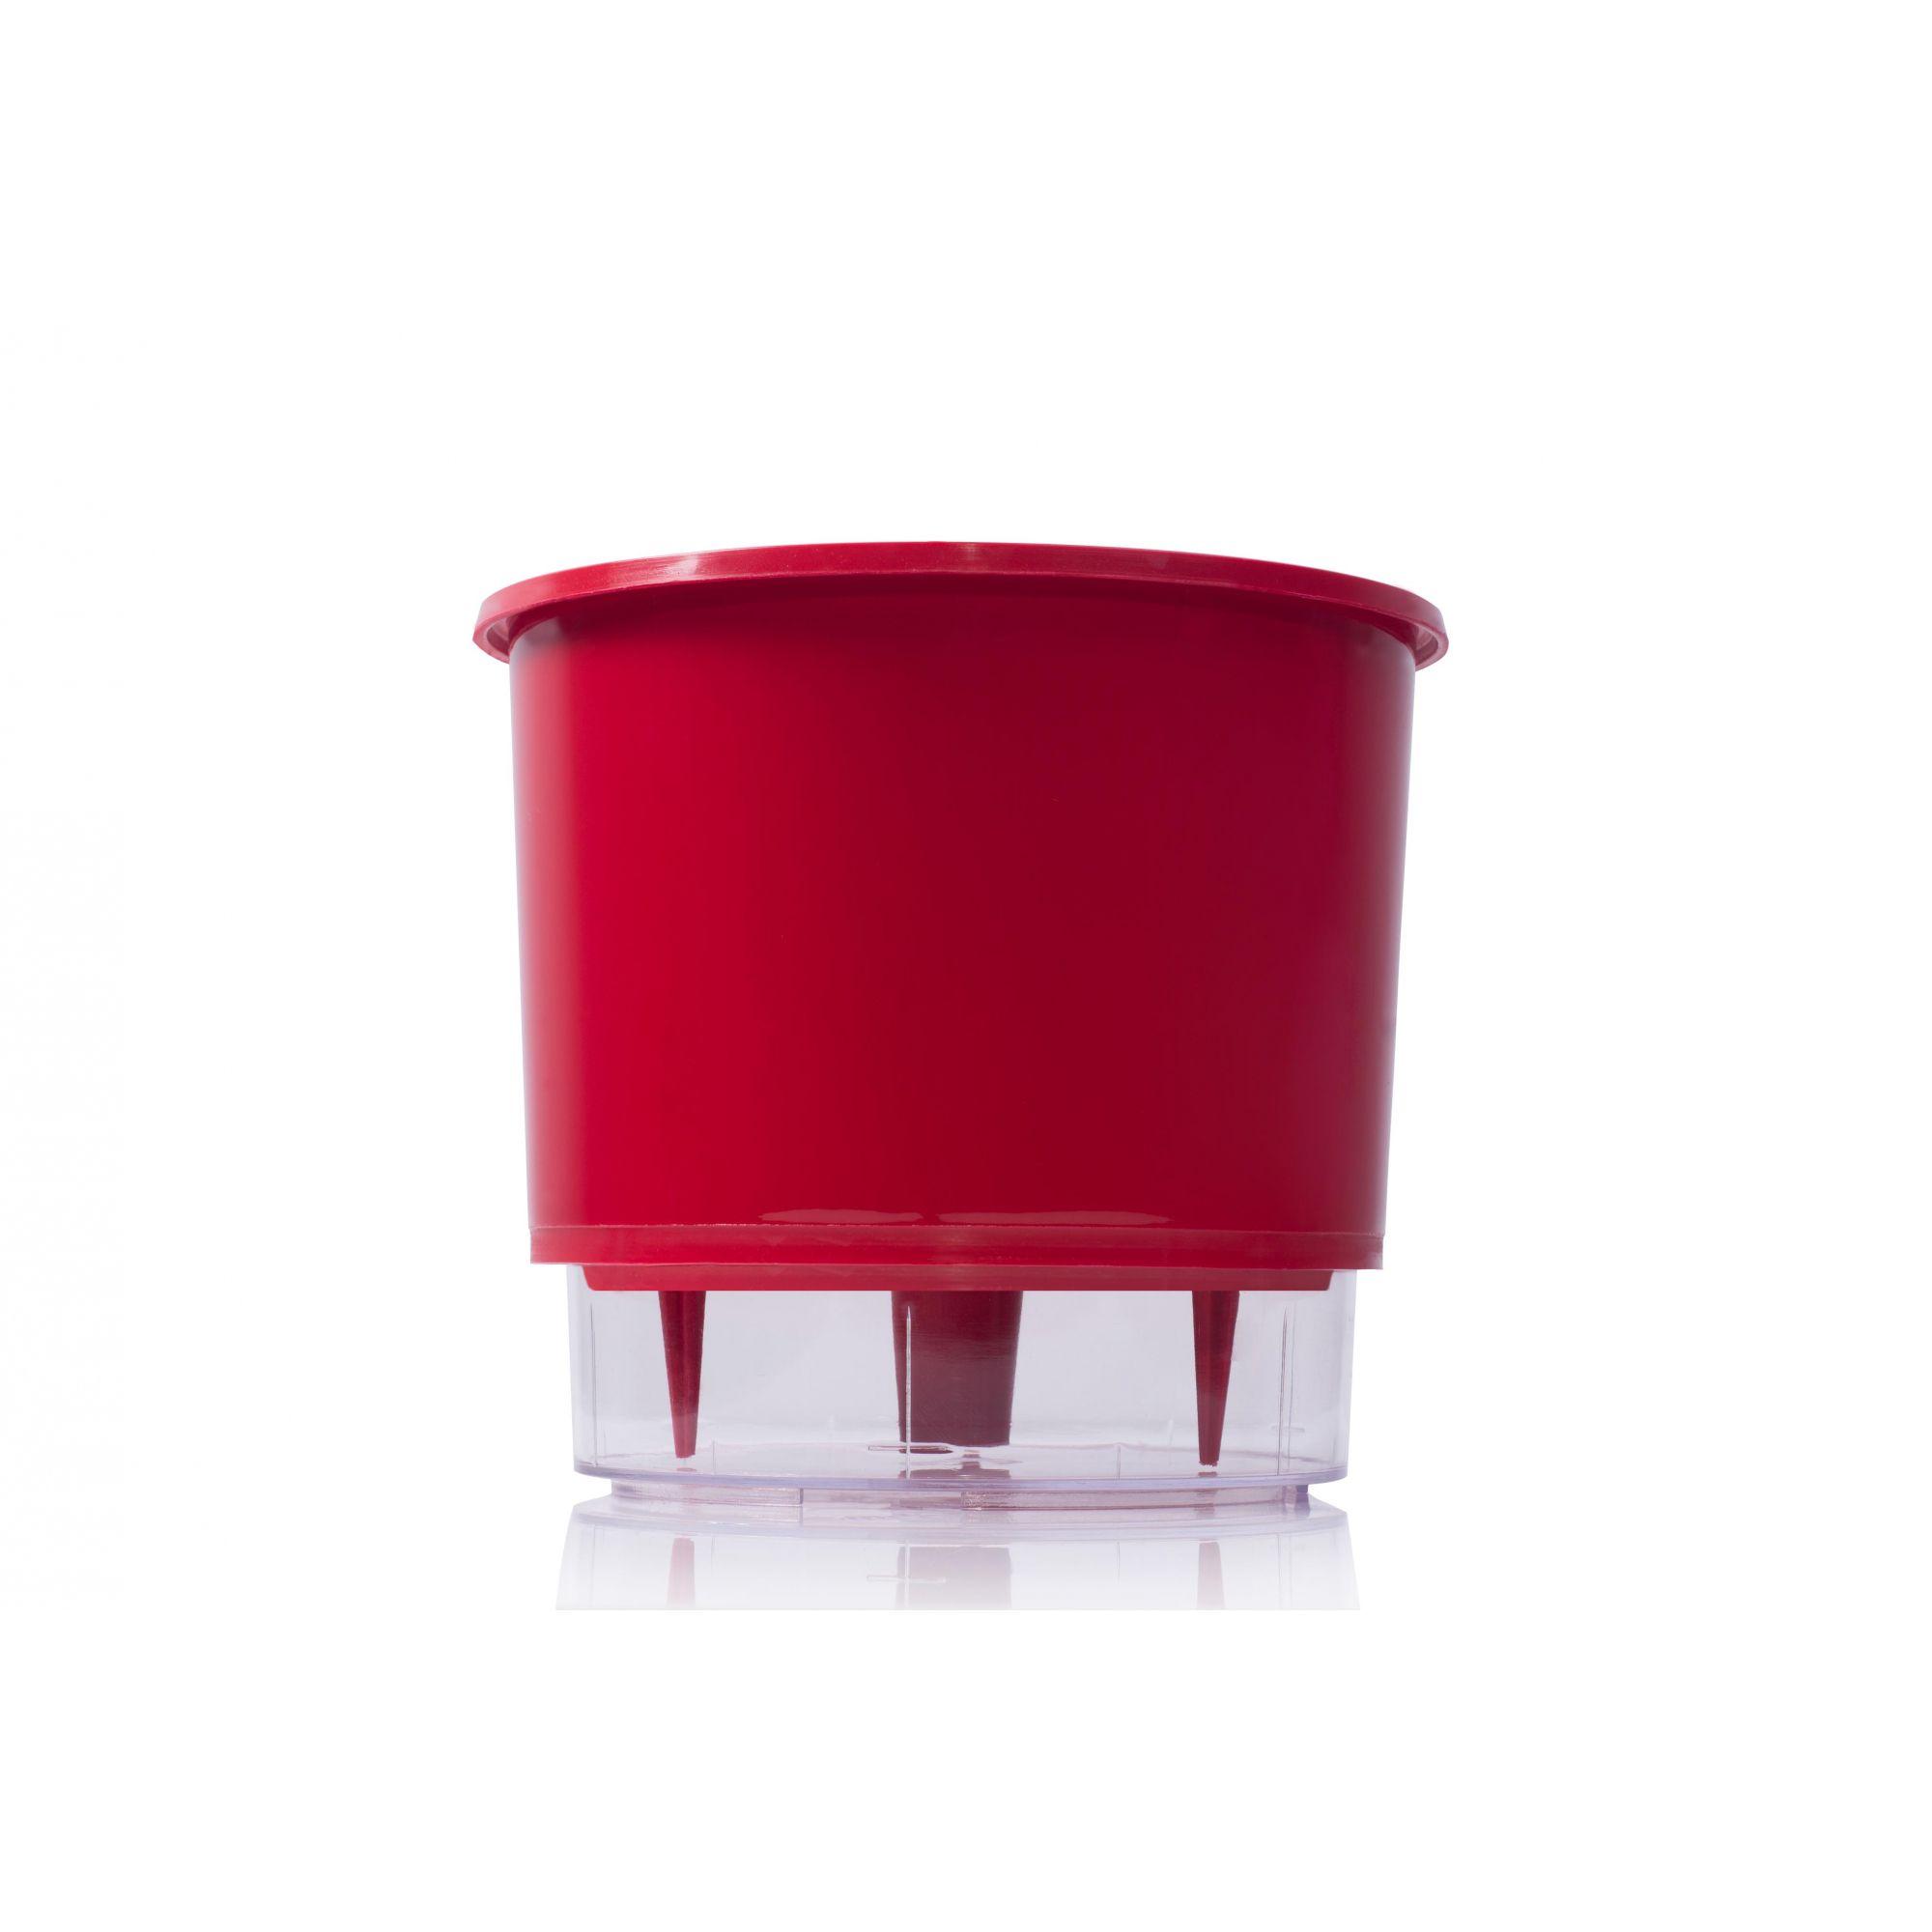 Vaso Autoirrigável 3 Vermelho Raiz